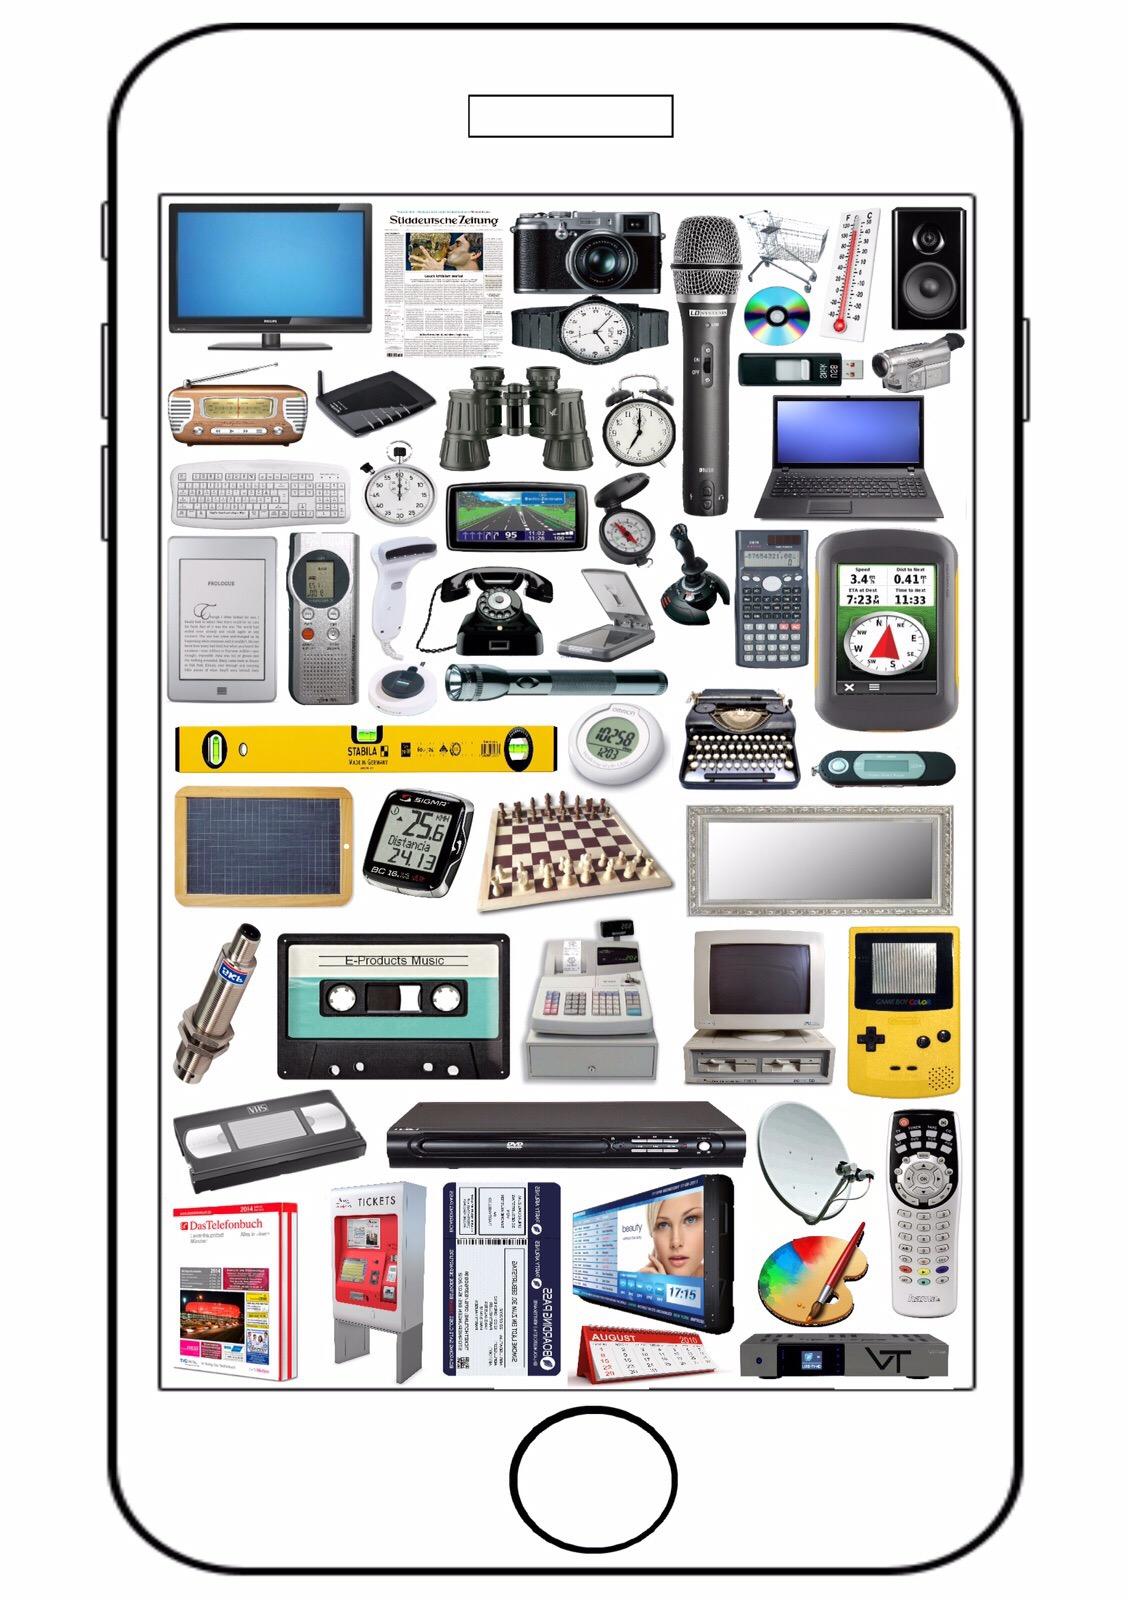 Iphone  Wlan Grau Hinterlegt